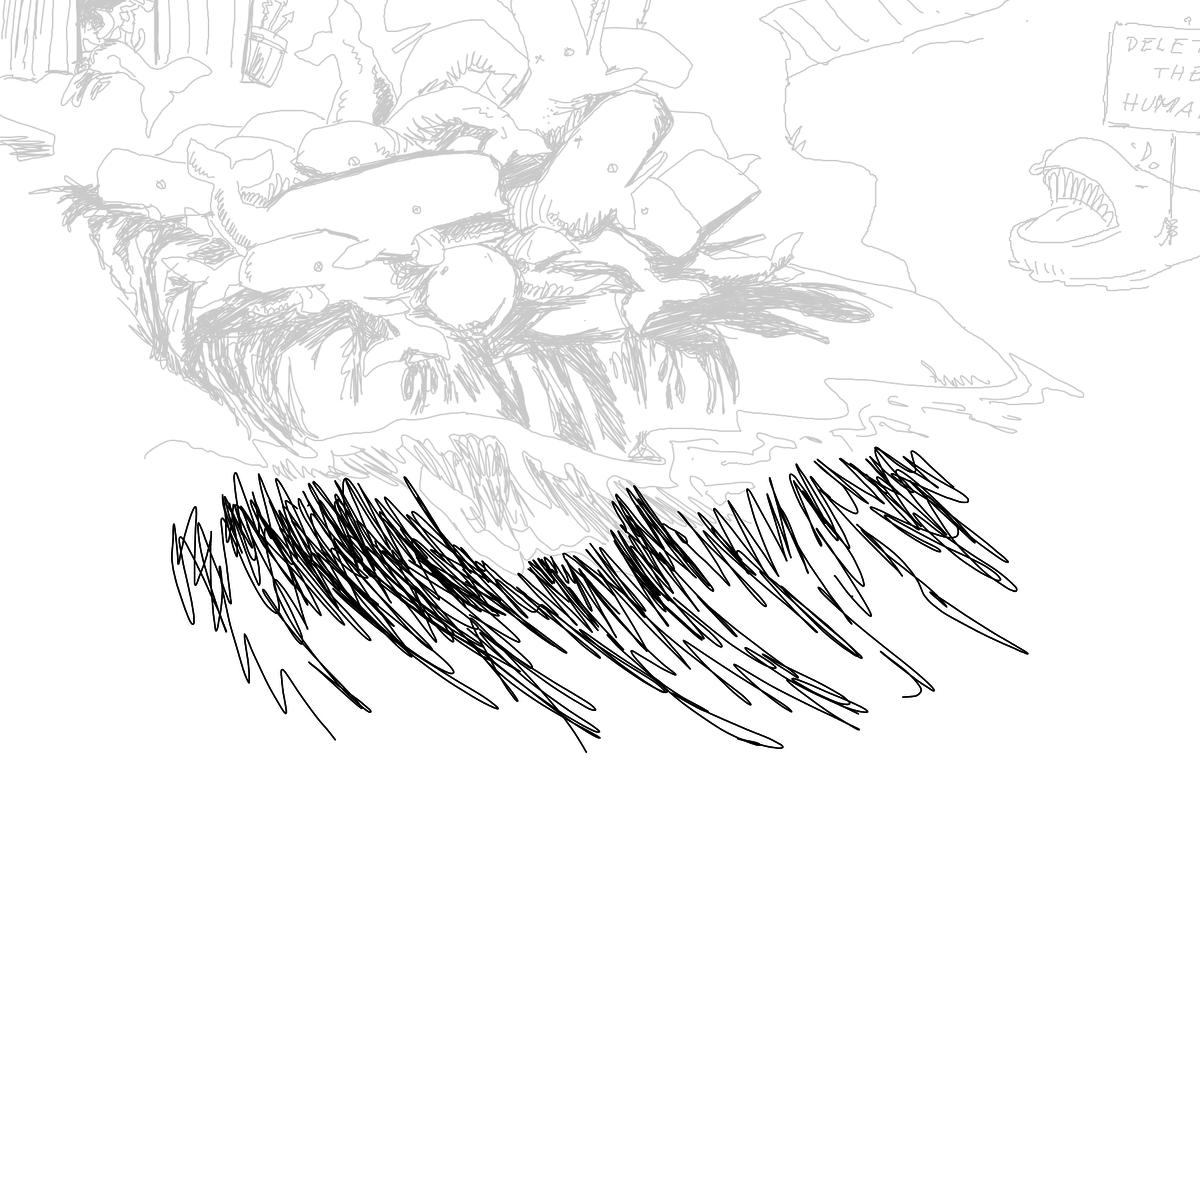 BAAAM drawing#3342 lat:78.4175796508789000lng: -4.4385619163513180